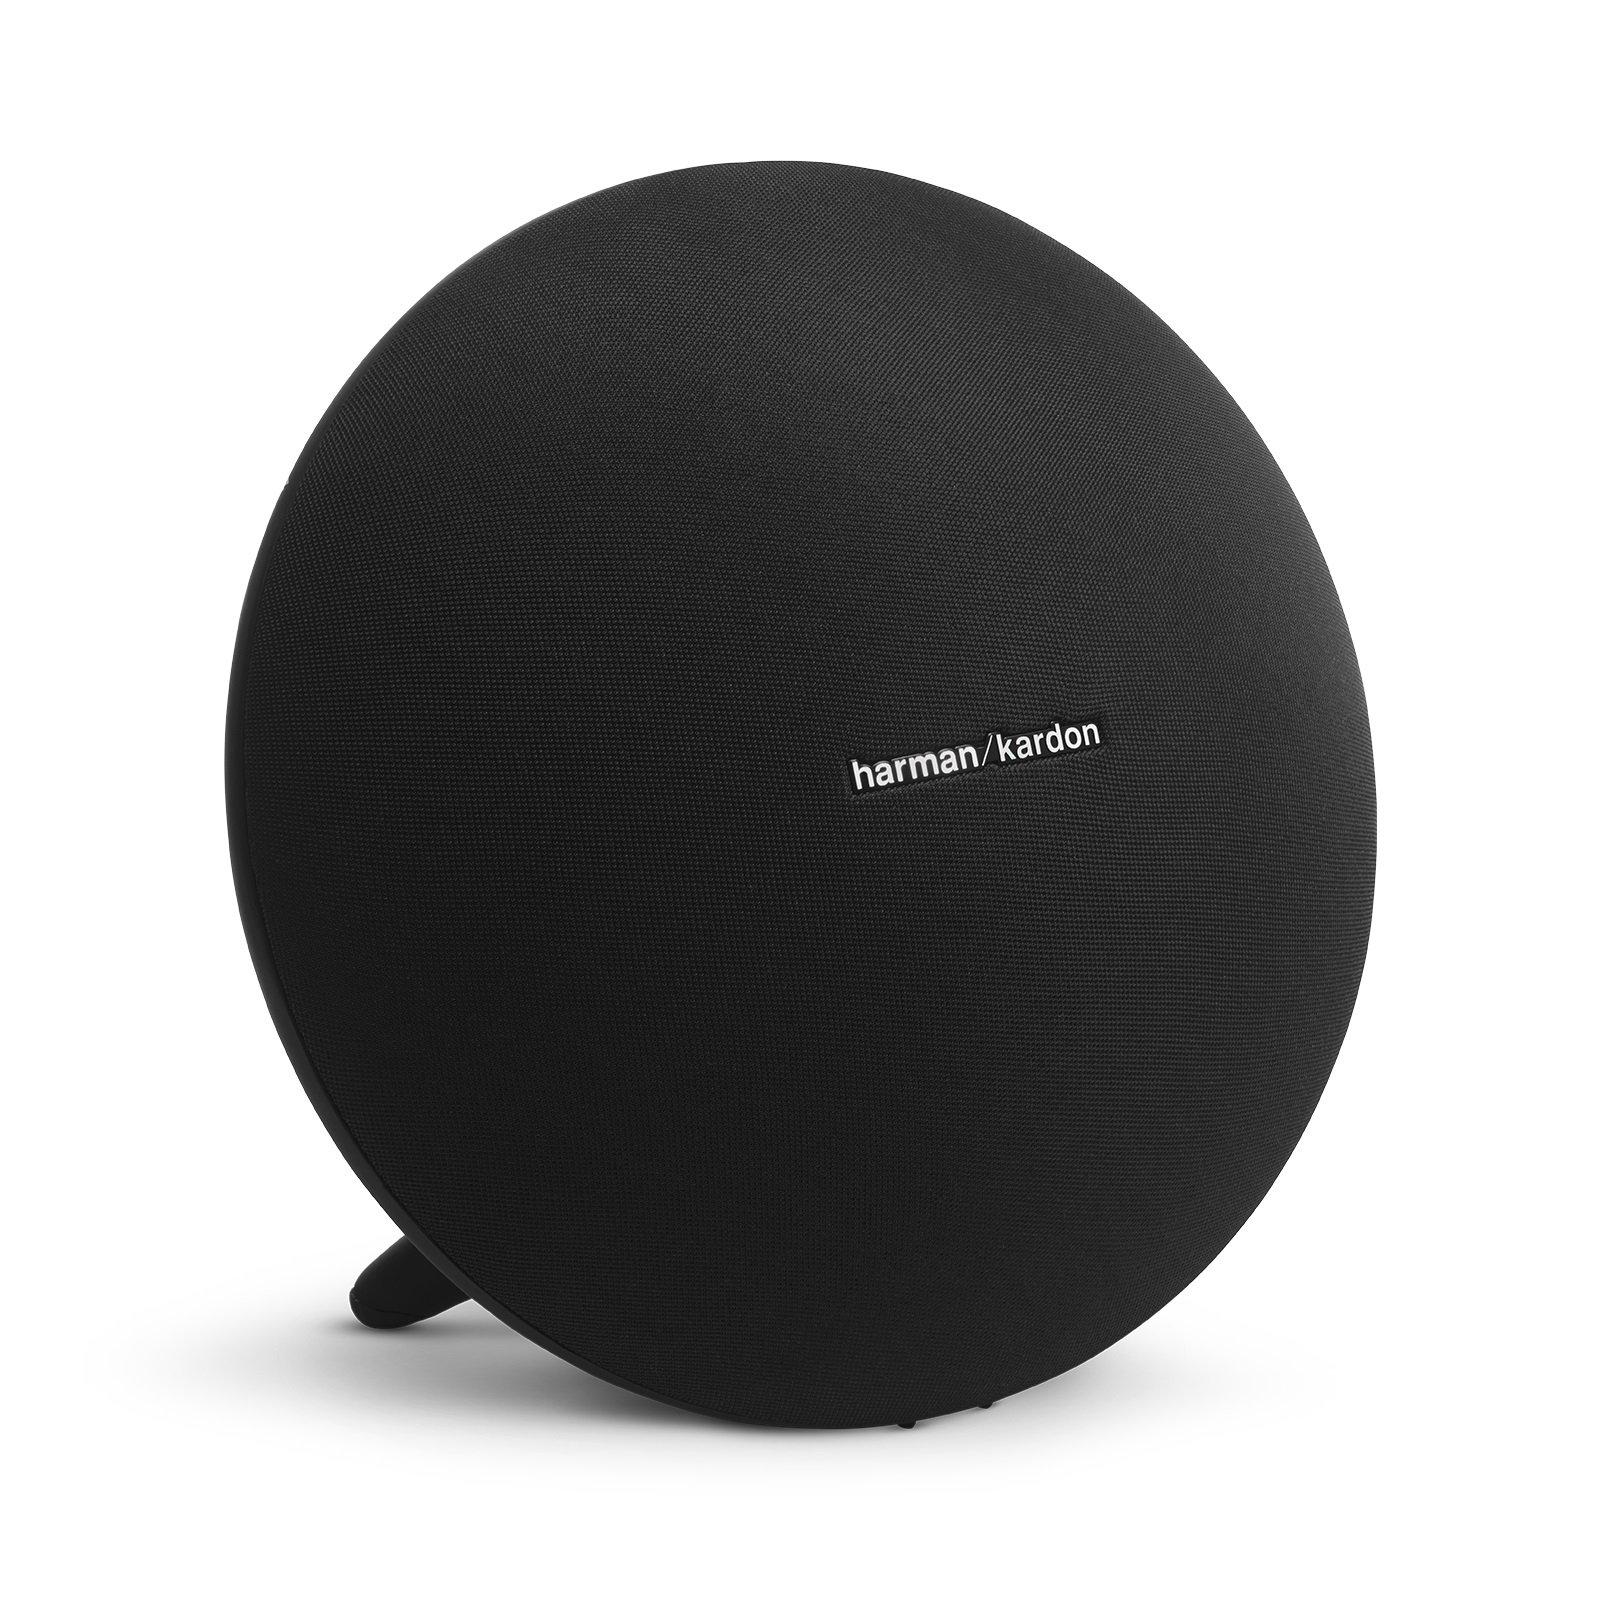 Harman Kardon Onyx Studio 4 Wireless Bluetooth Speaker Black (New Model by Harman Kardon